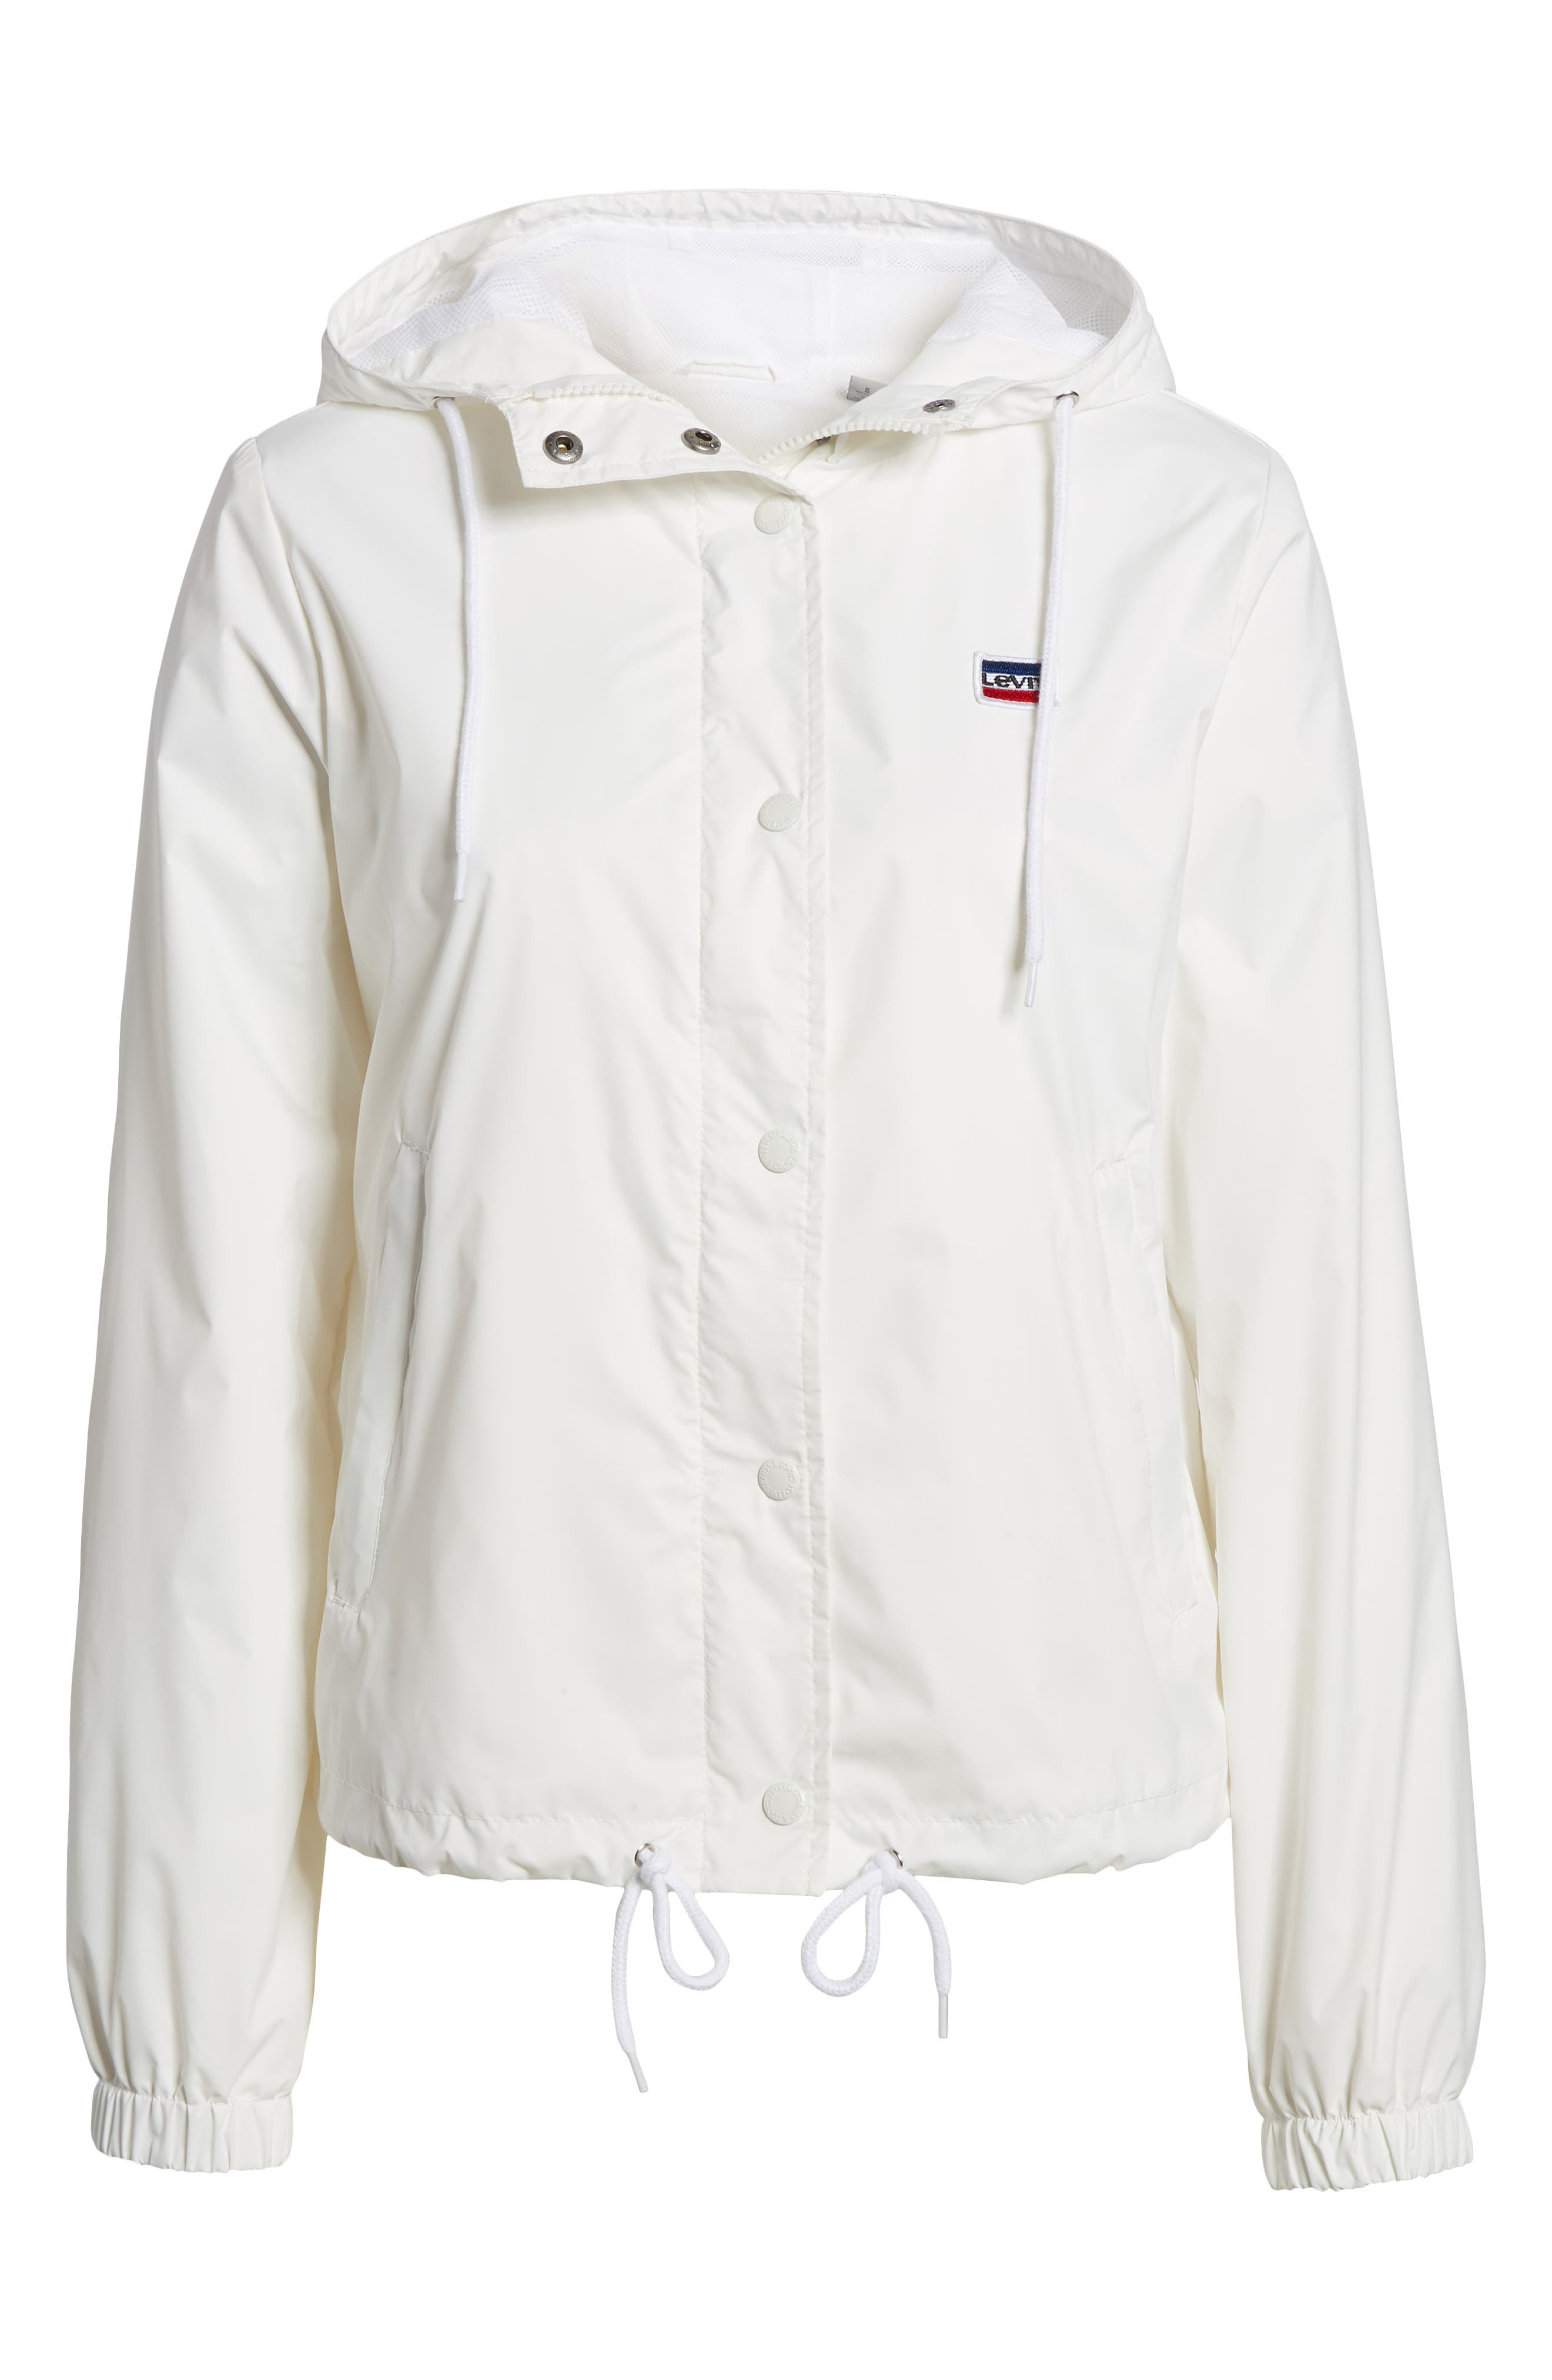 Retro Hooded Coach's Jacket,                             Alternate thumbnail 6, color,                             100